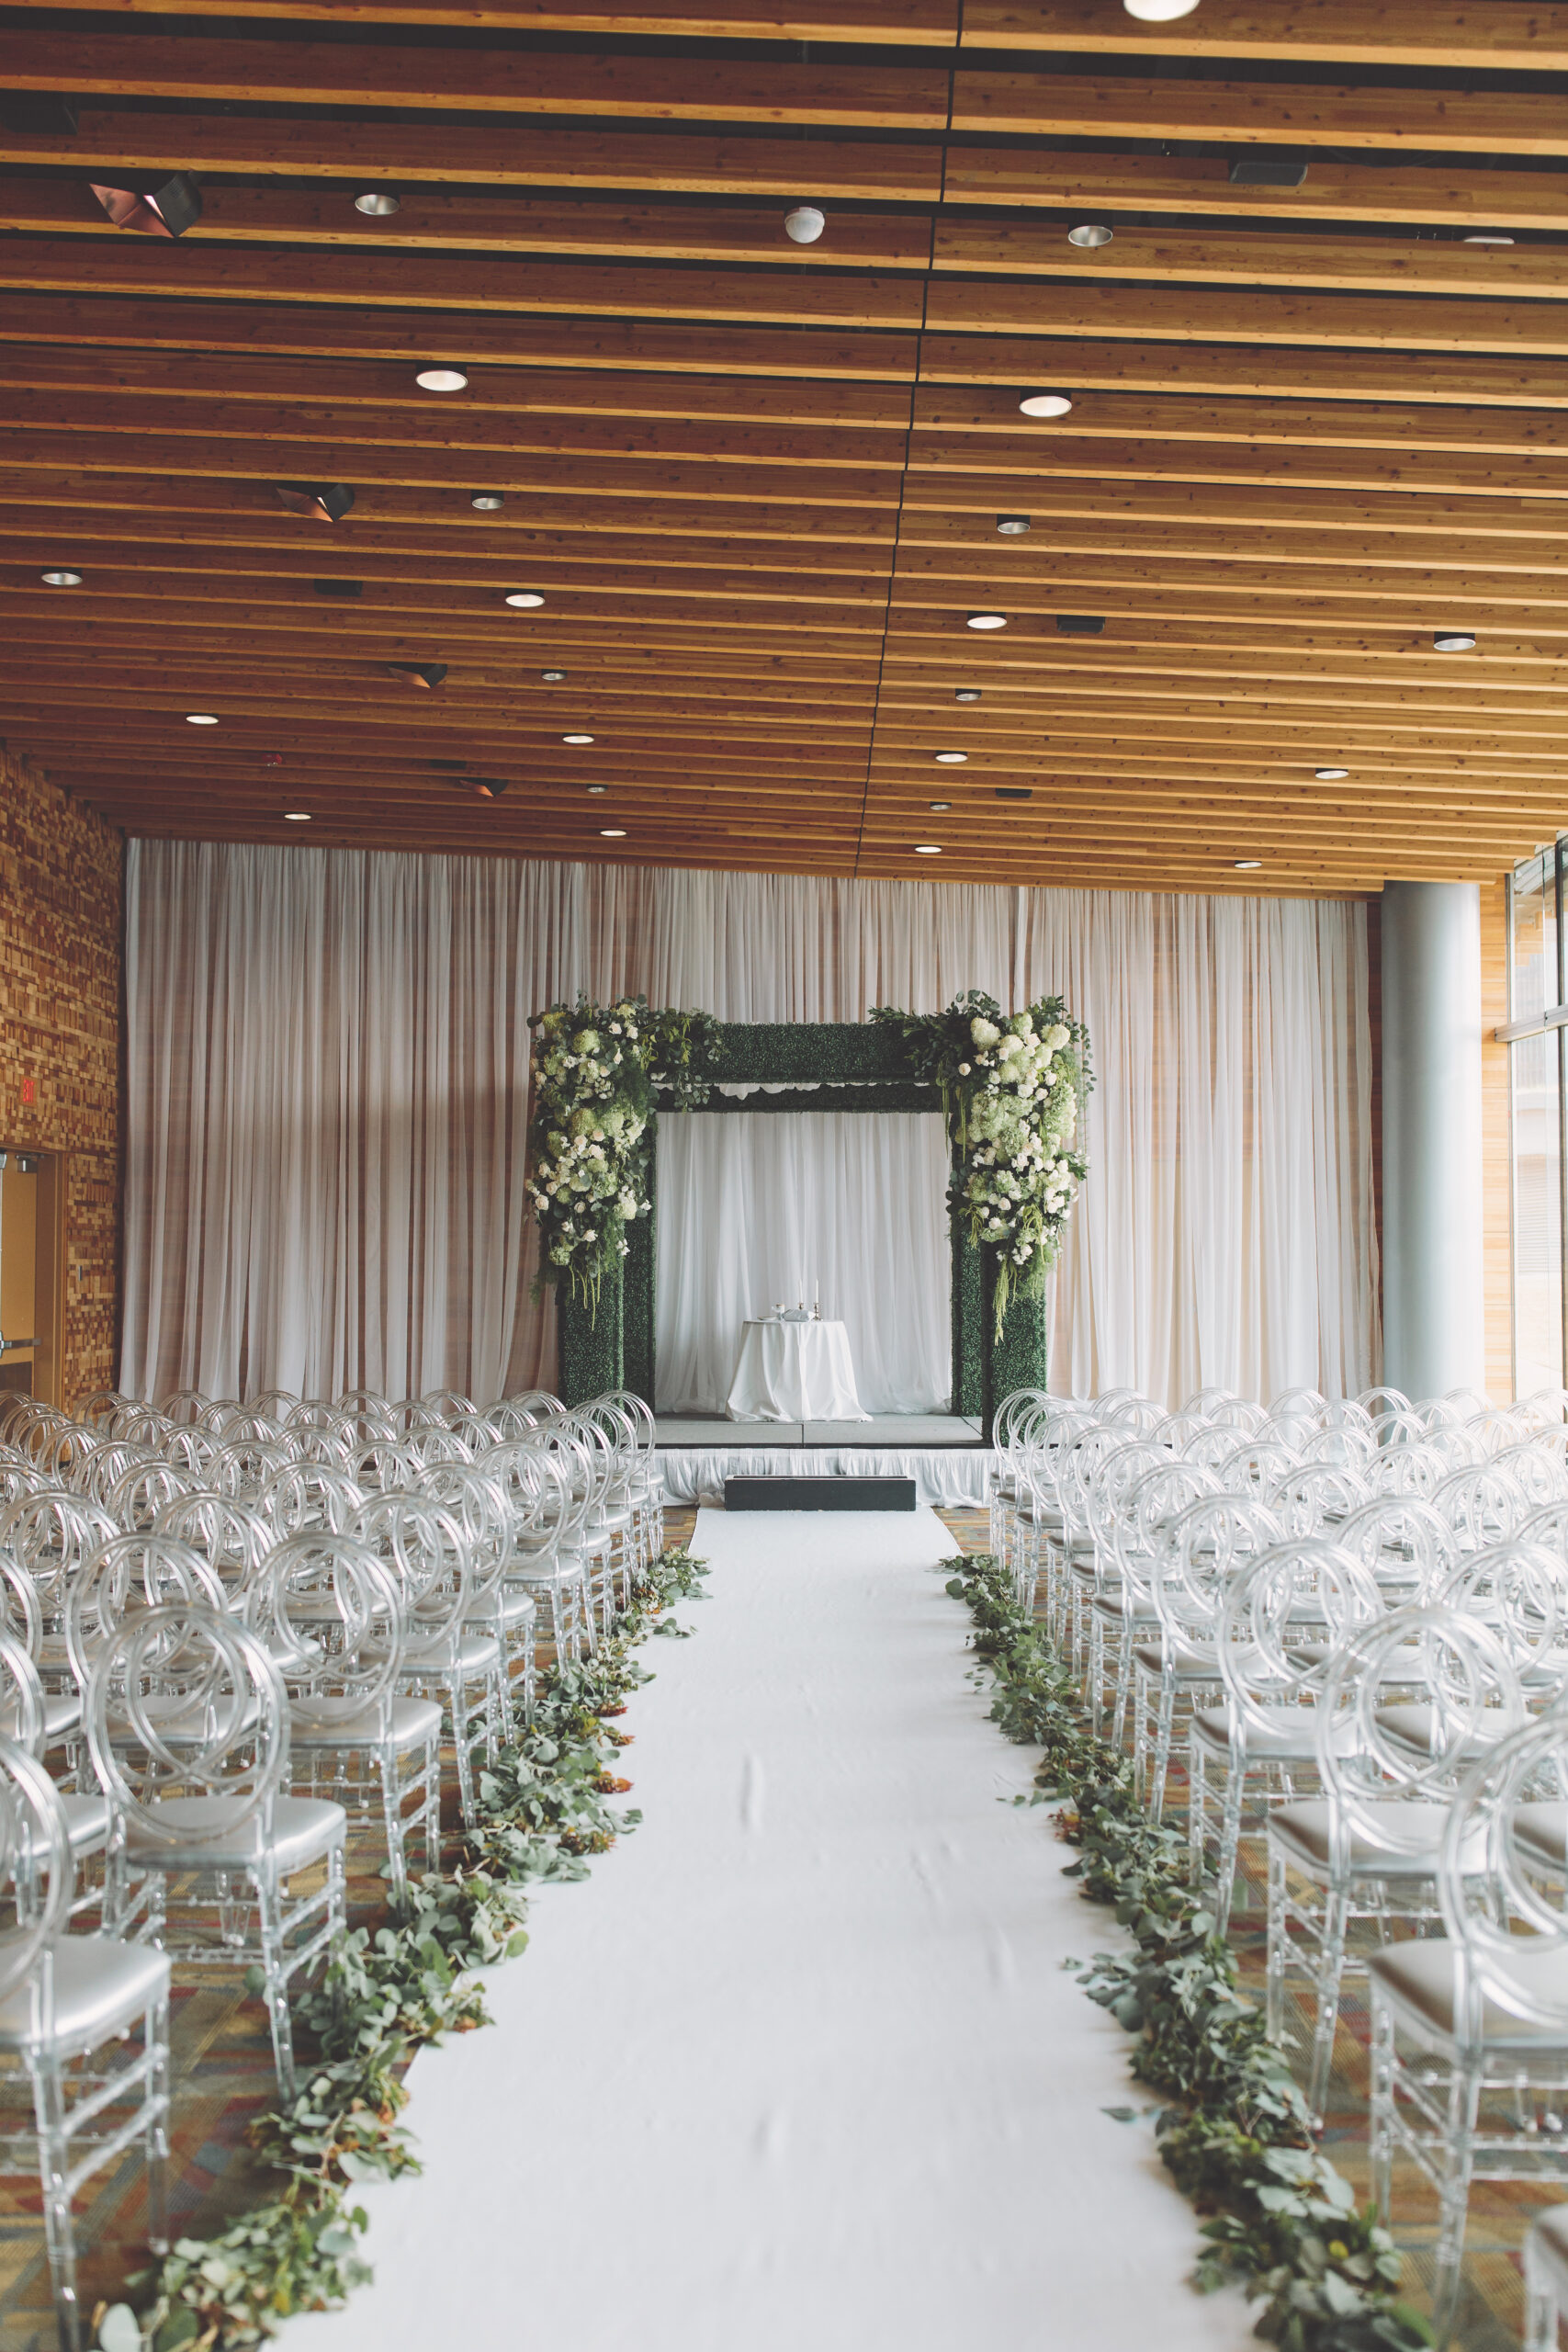 https://secureservercdn.net/45.40.145.151/kgq.ab5.myftpupload.com/wp-content/uploads/2020/04/Amanda-Daniel-Wedding-0393-scaled.jpg?time=1606472051